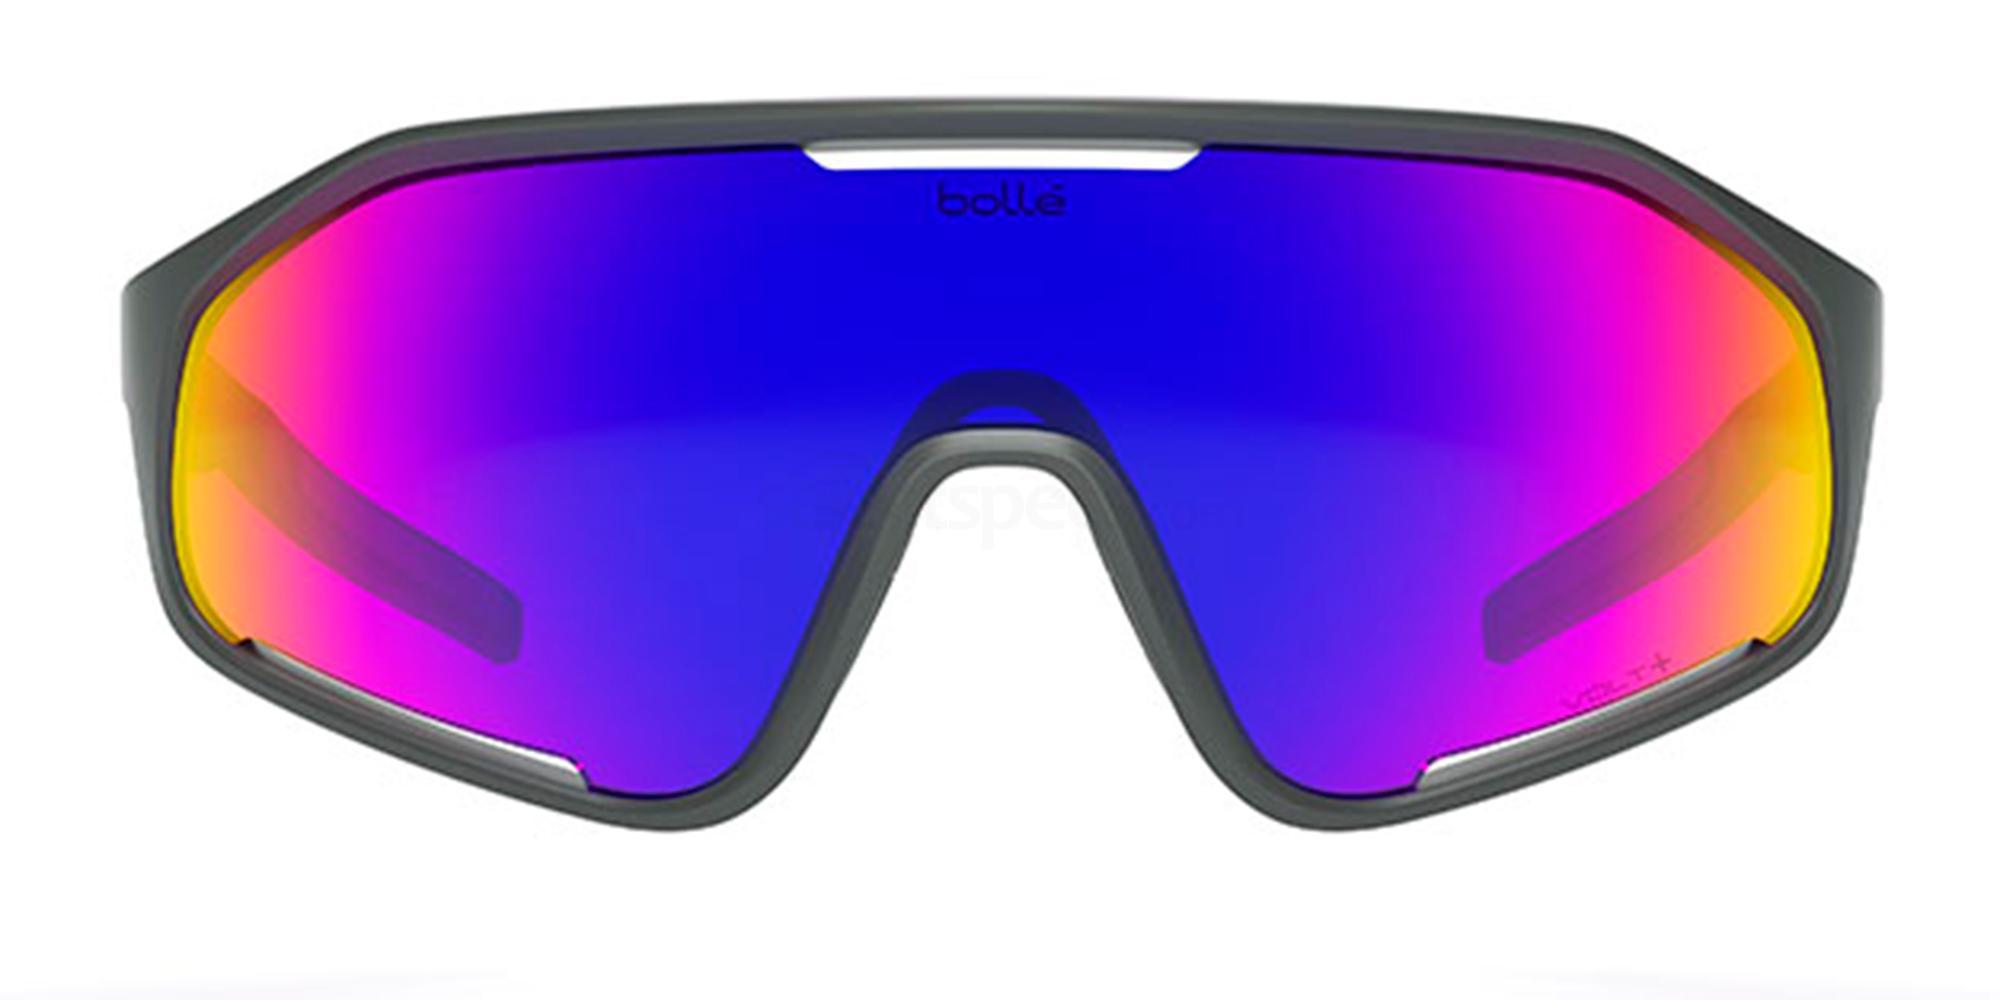 BS010001 SHIFTER Polarized Sunglasses, Bolle